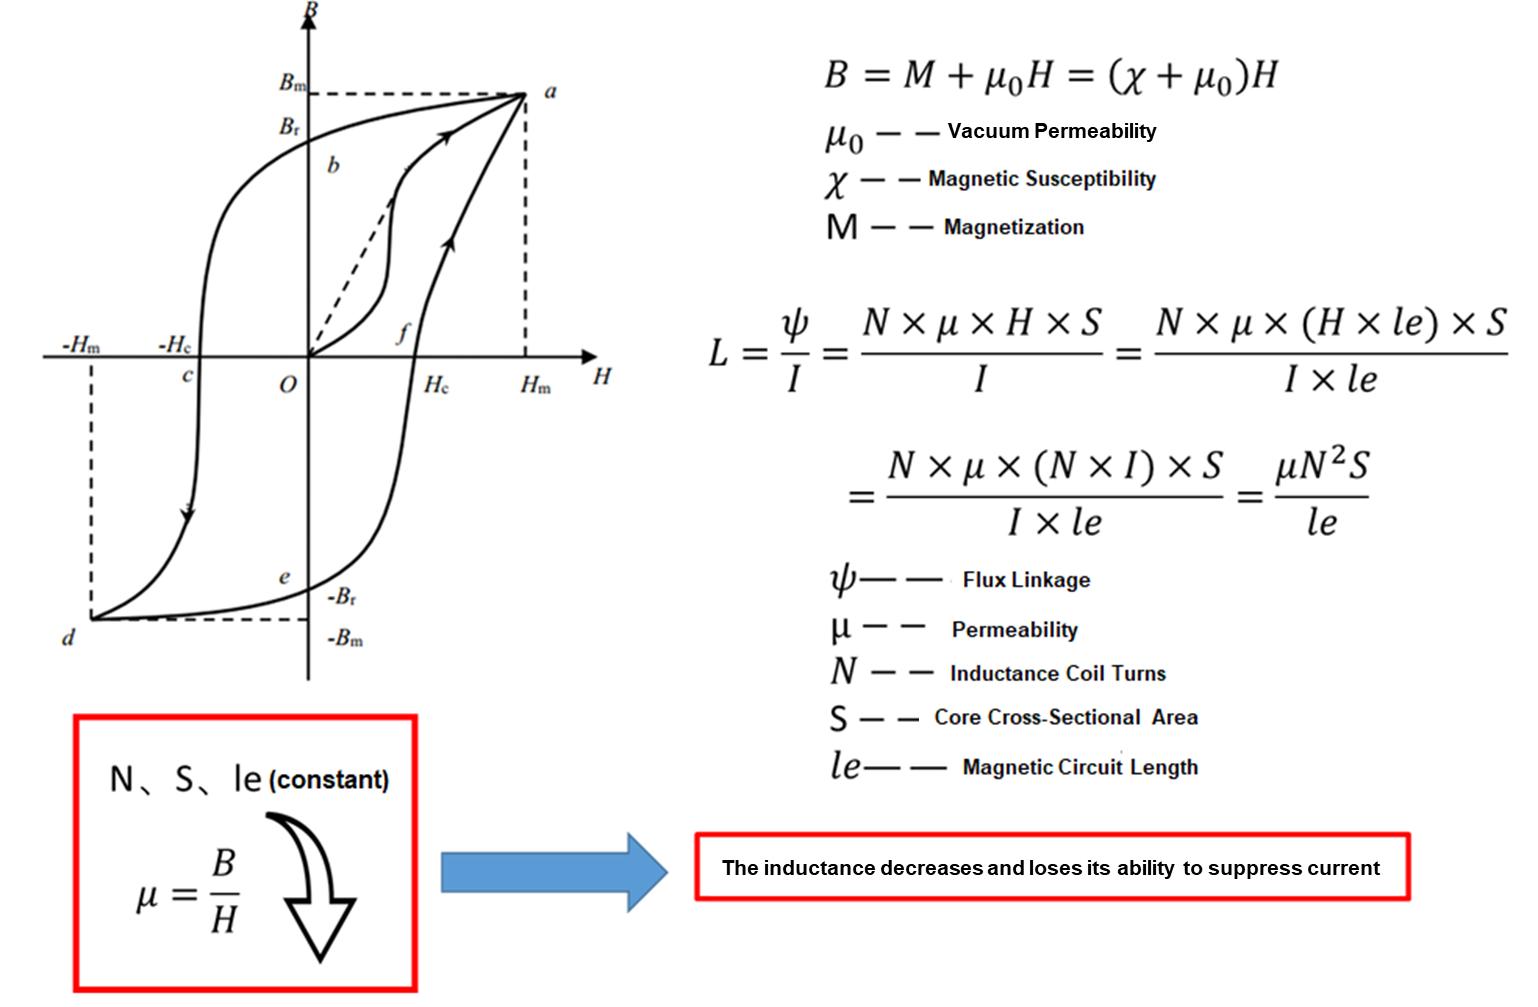 Figure 2: Magnetization Curve and Formulas